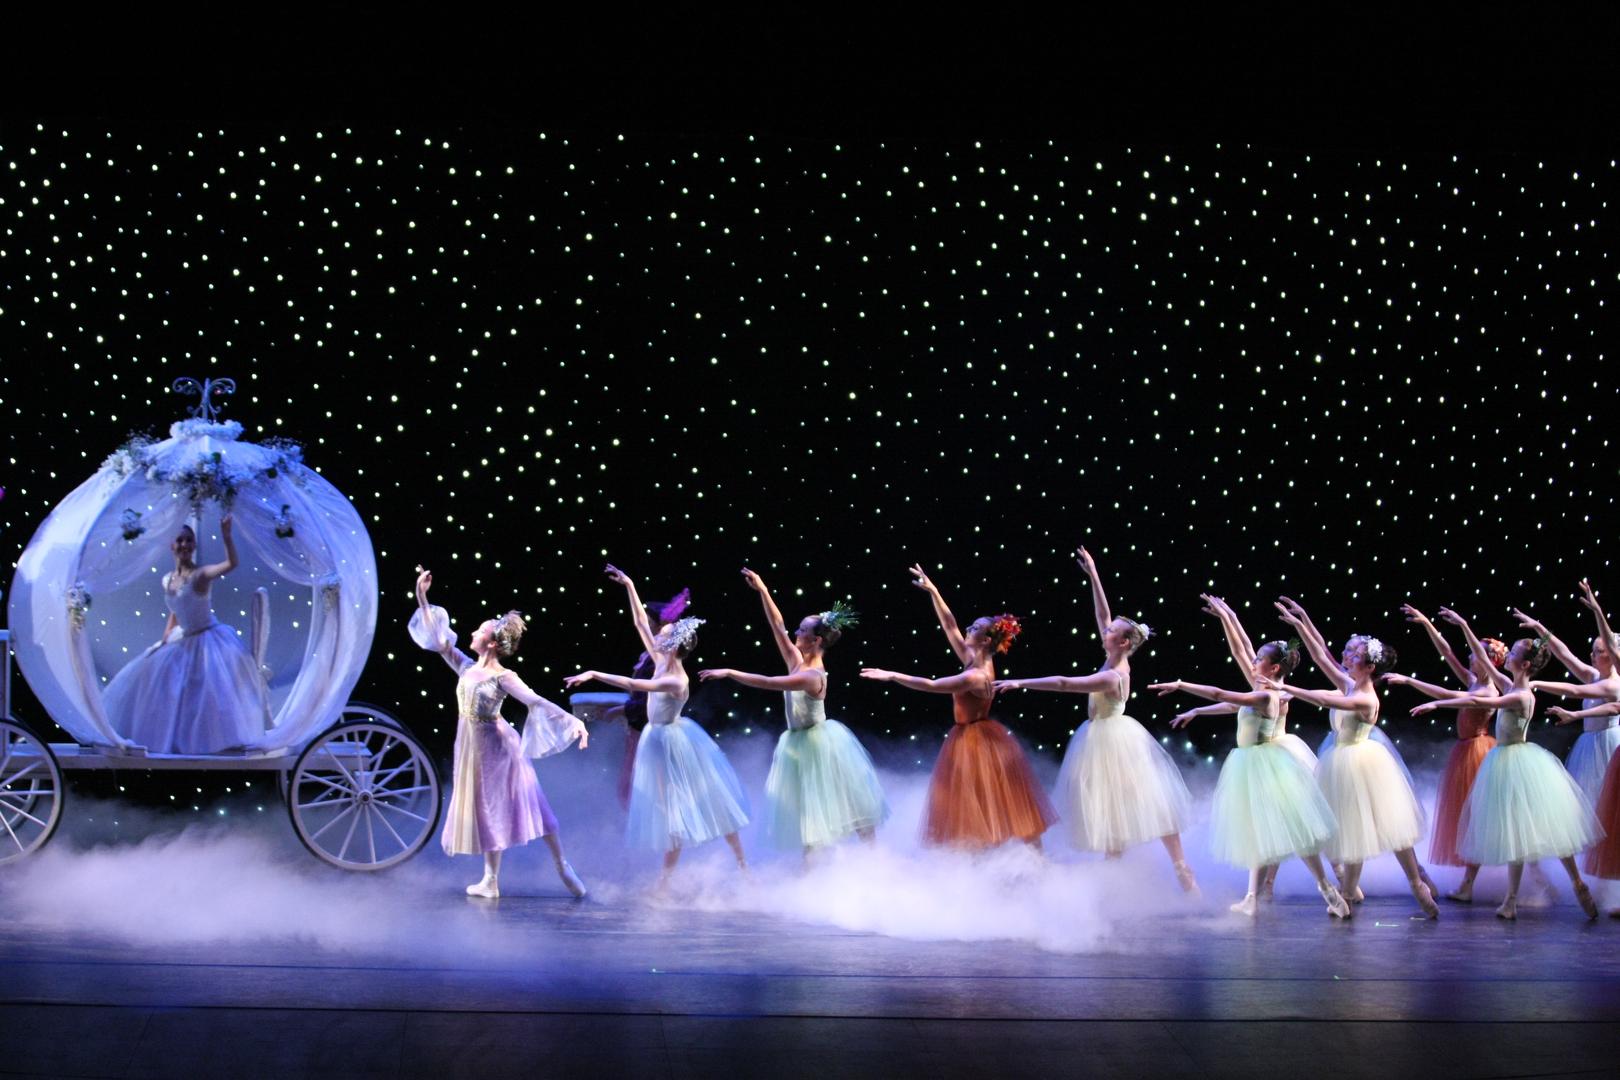 Ballet Etudes performs Cinderella